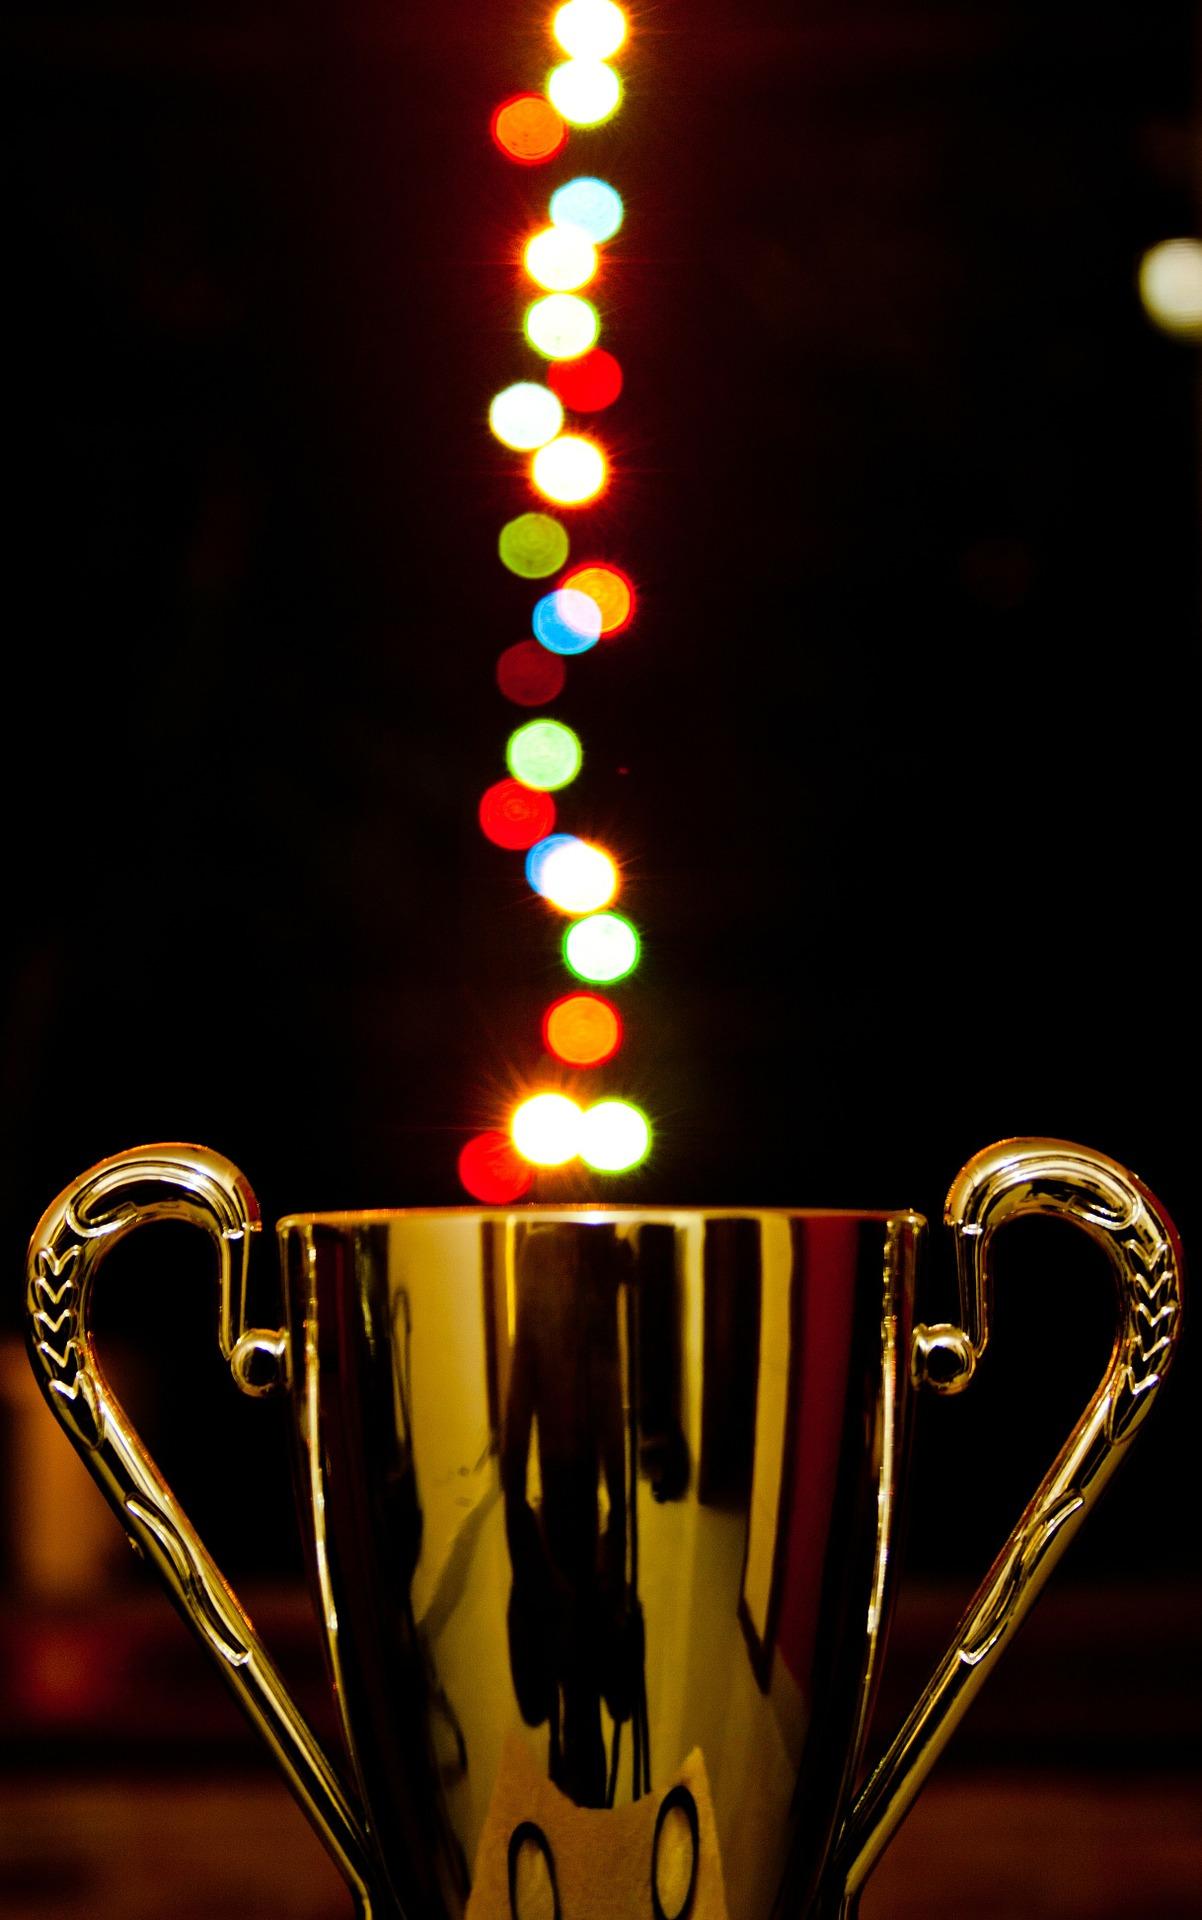 award-166945_1920.jpg